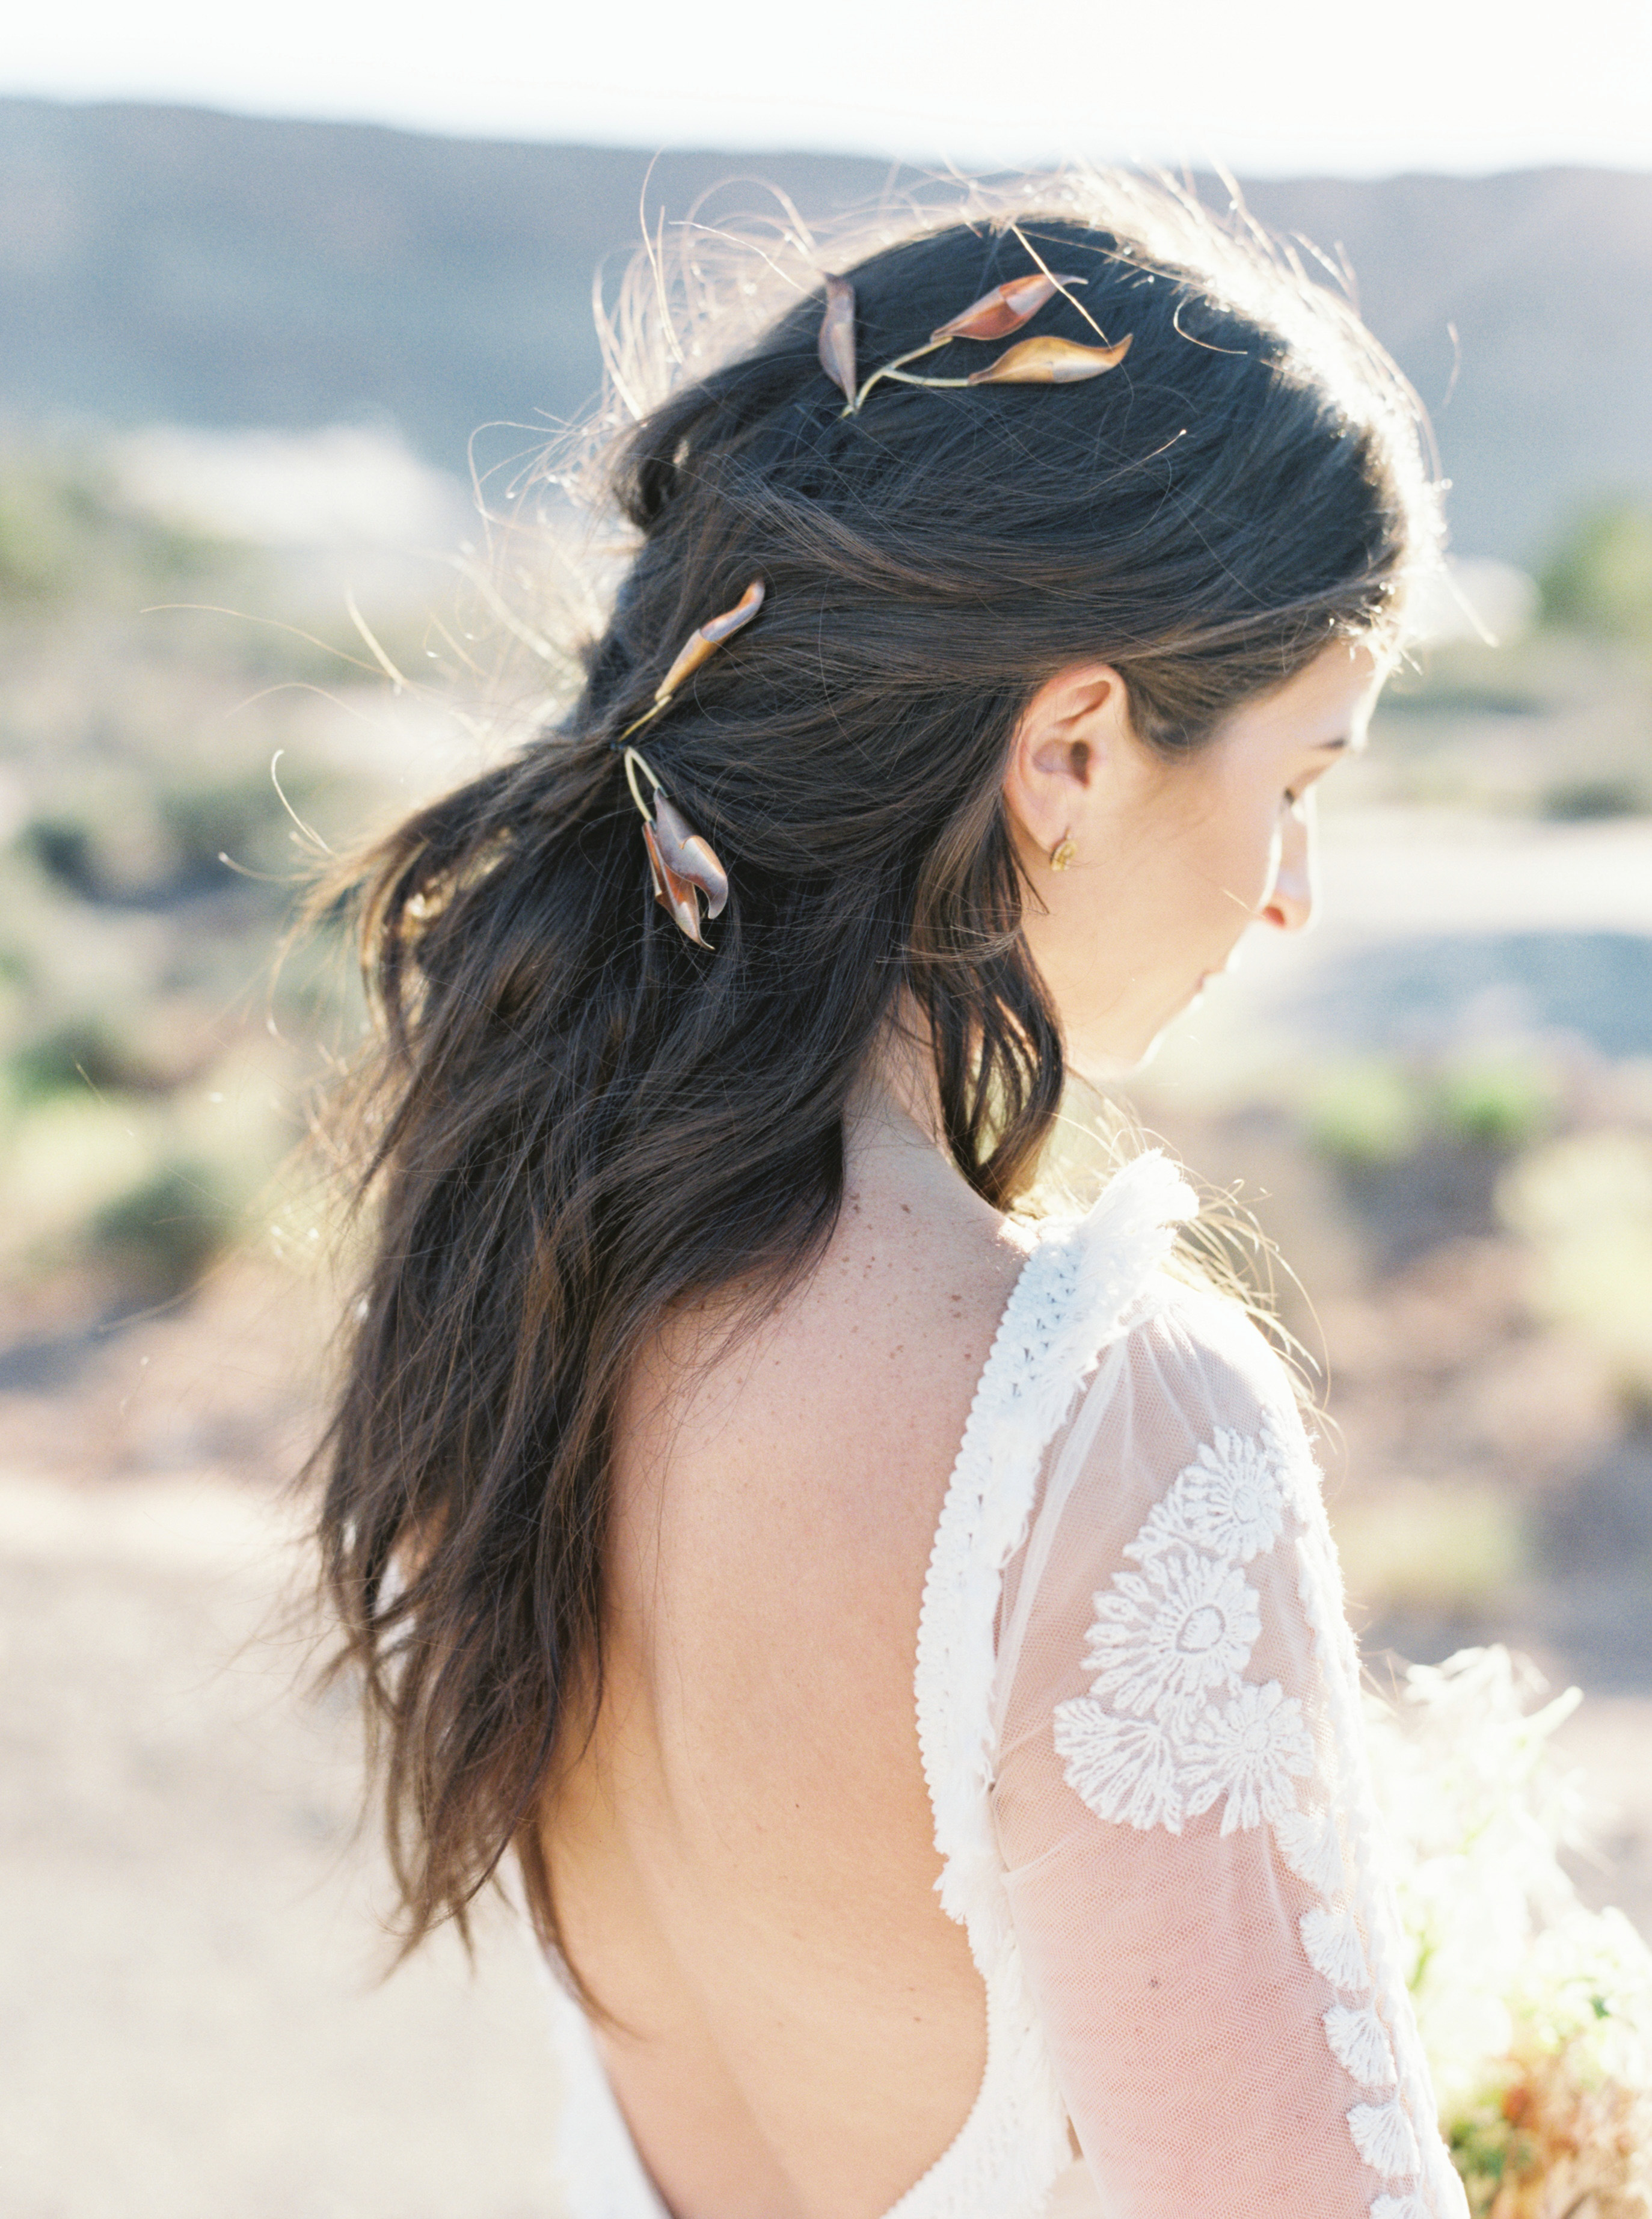 jeanette david wedding bride hair style